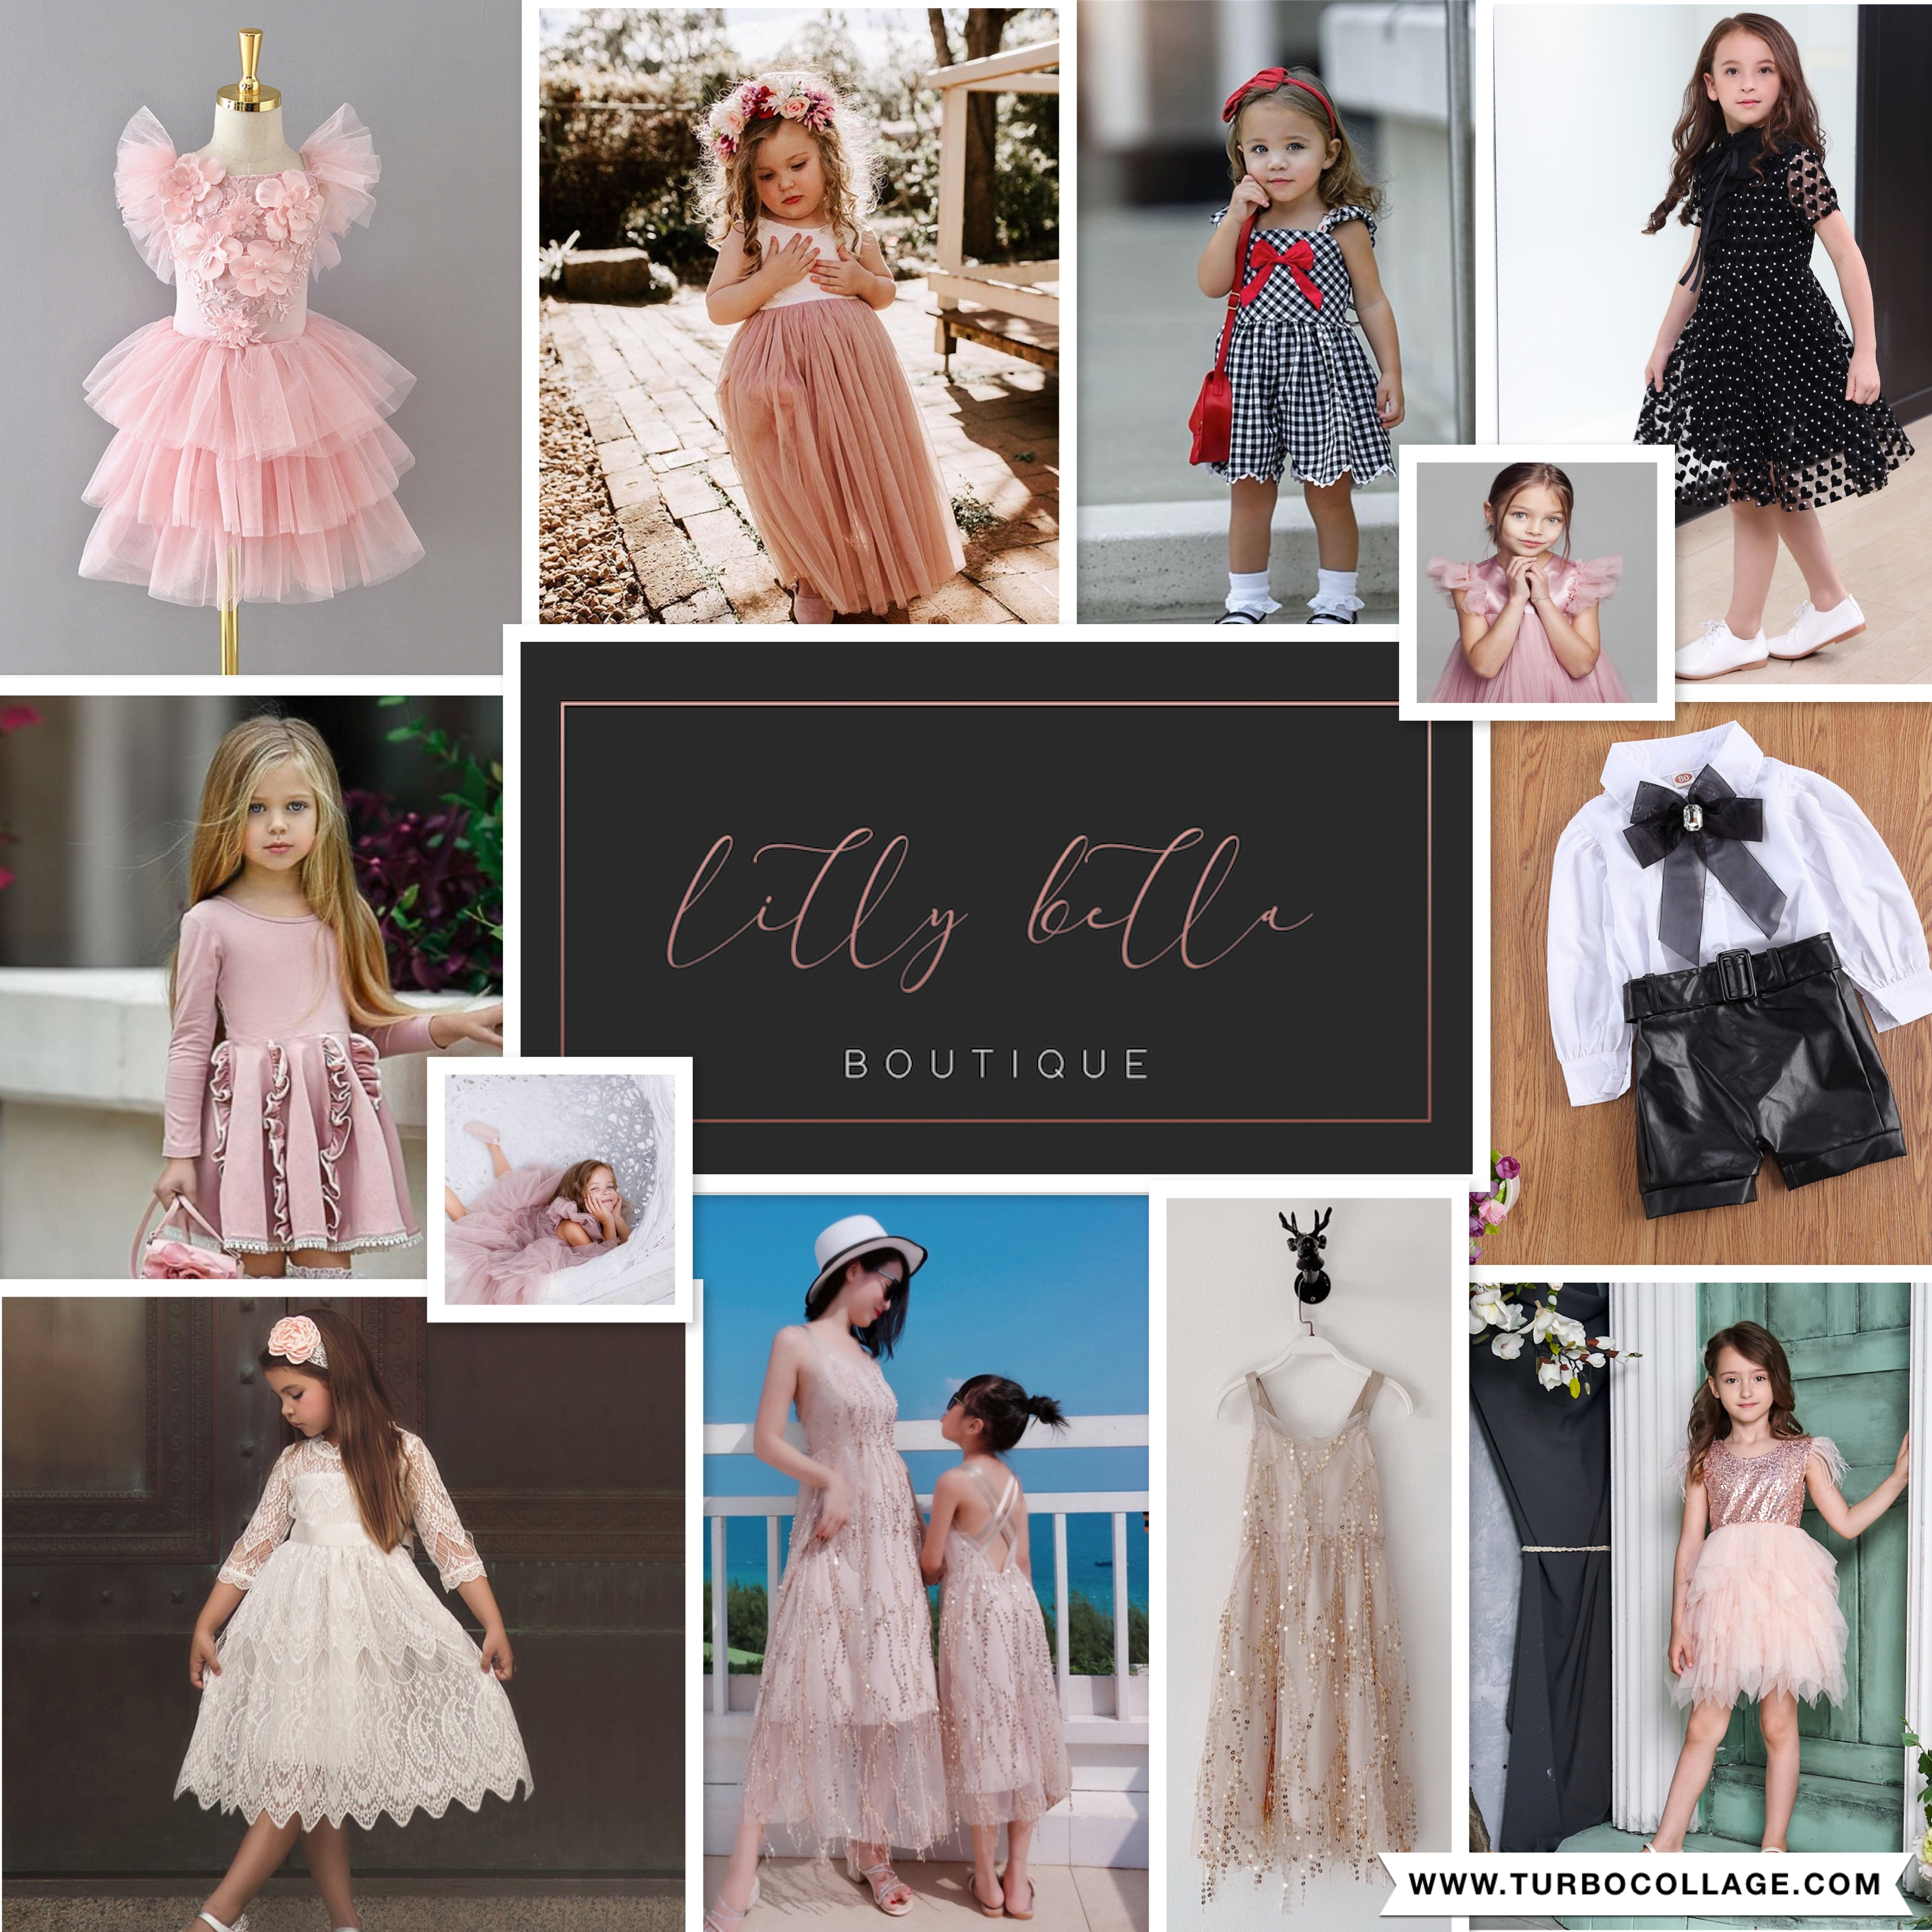 LillyBella Boutique